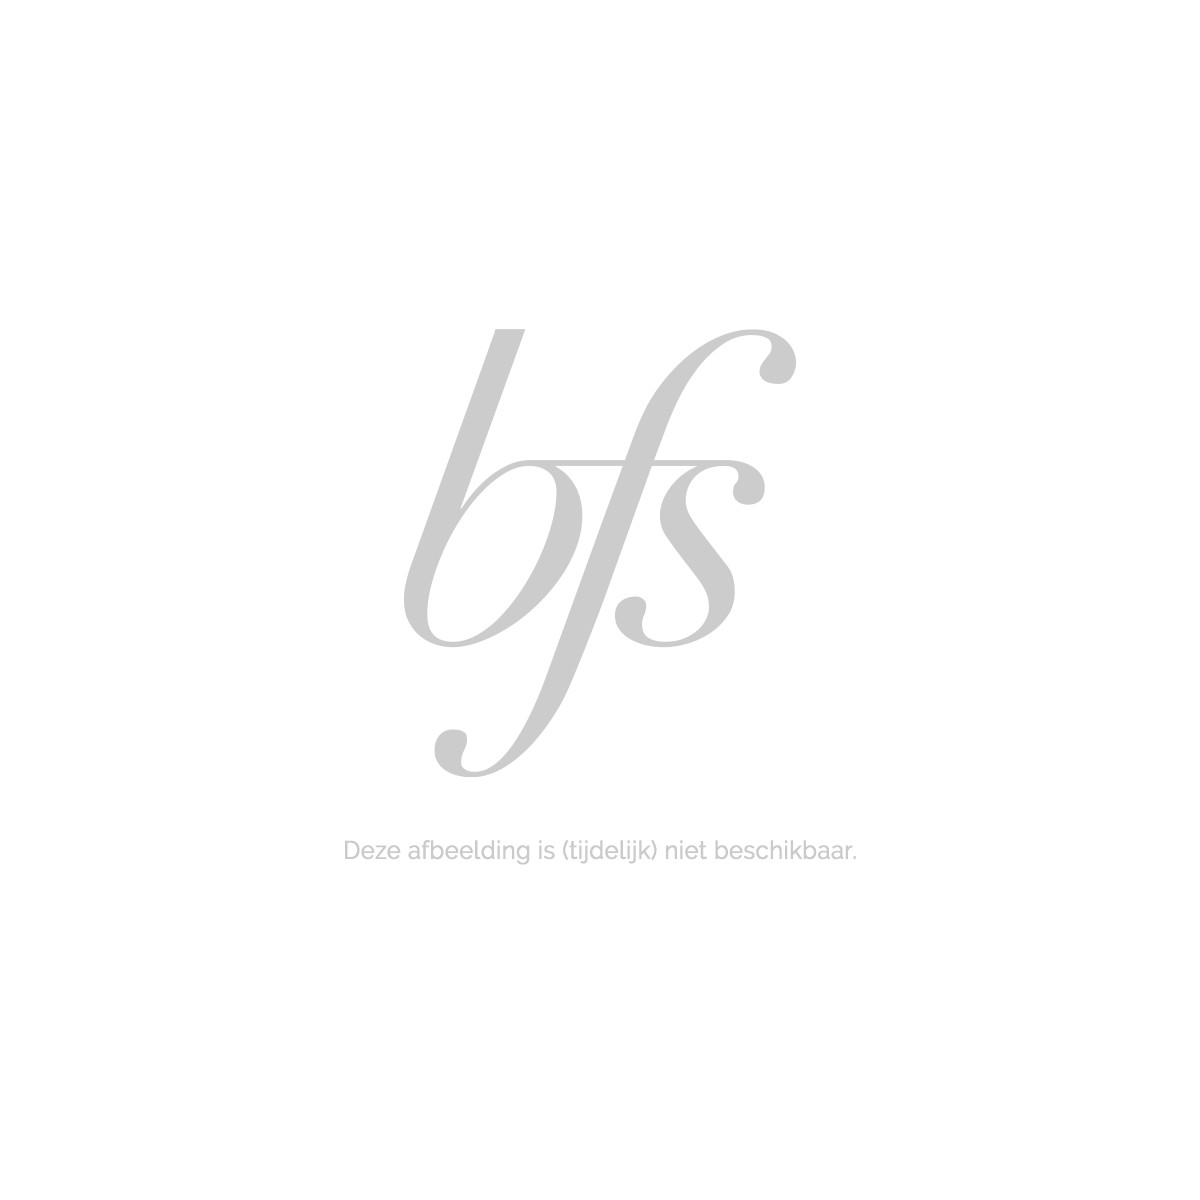 Yves Saint Laurent Black Opium Intense For Women Eau De Parfum Spray 50 Ml